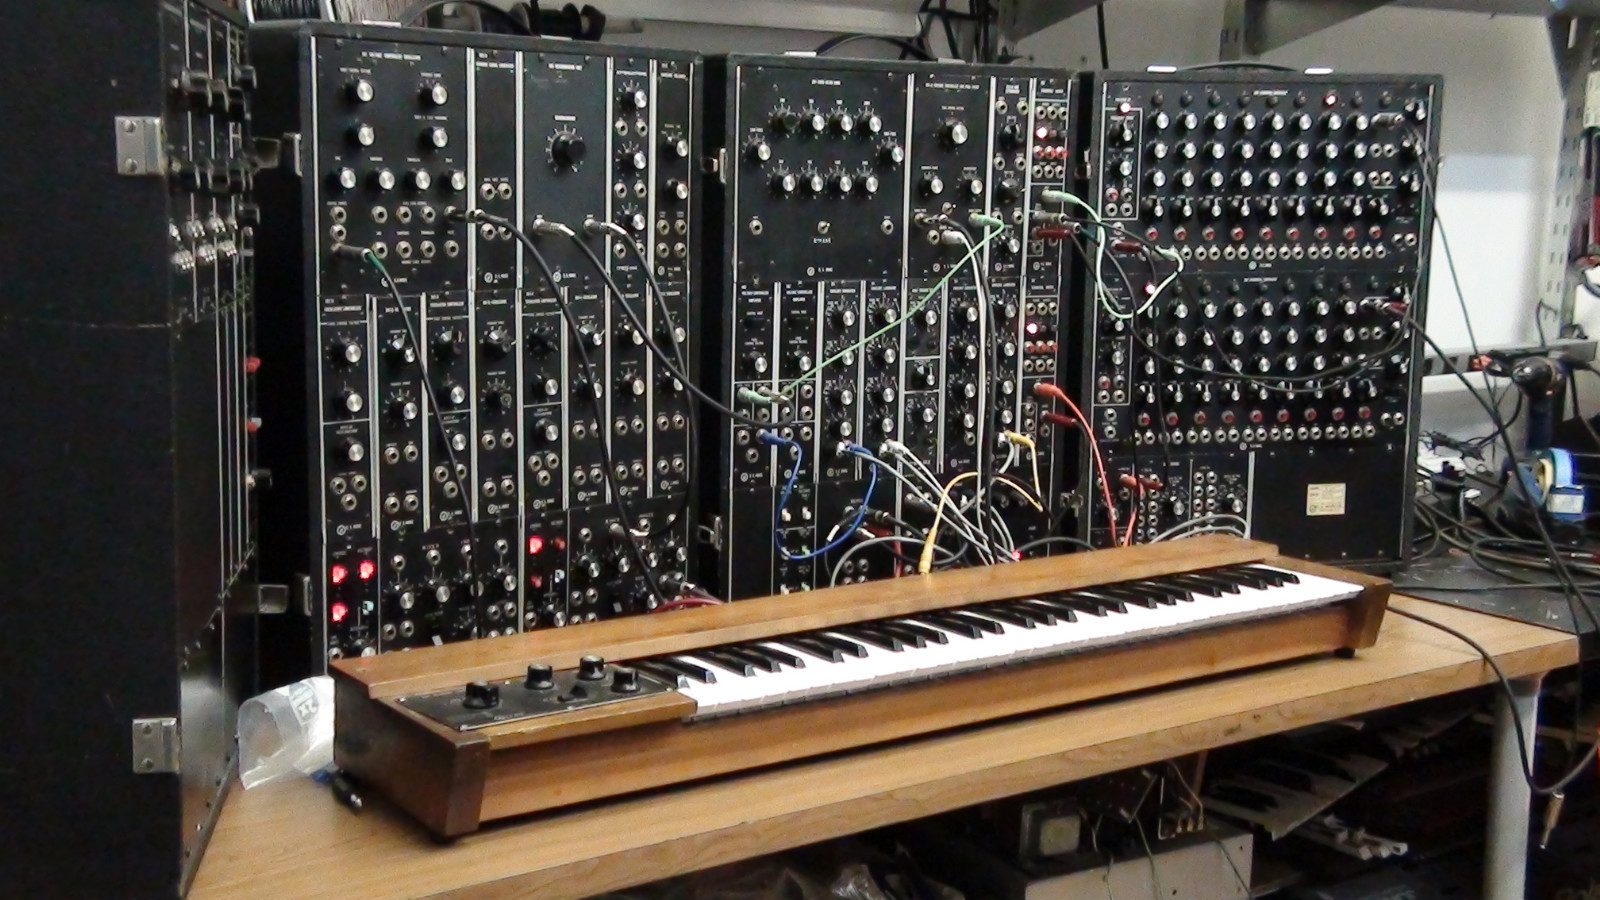 moog modular hd extraordinary - photo #4